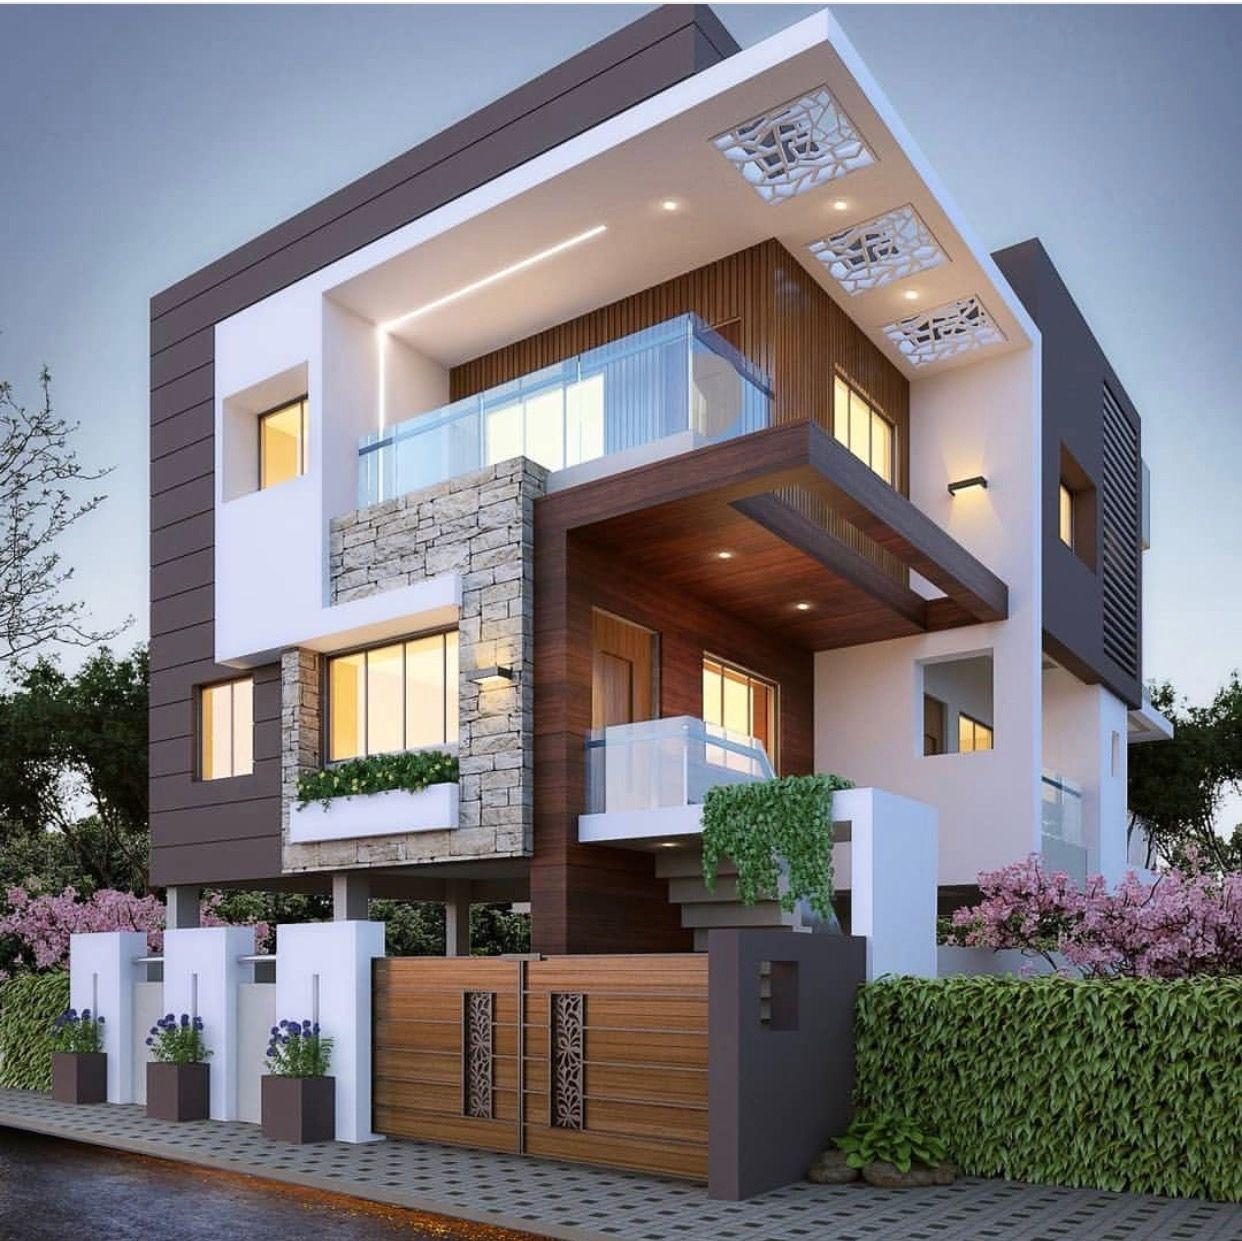 Stili Di Case Moderne.Pin By Arki Jeff On House Pinterest Architettura Architettura